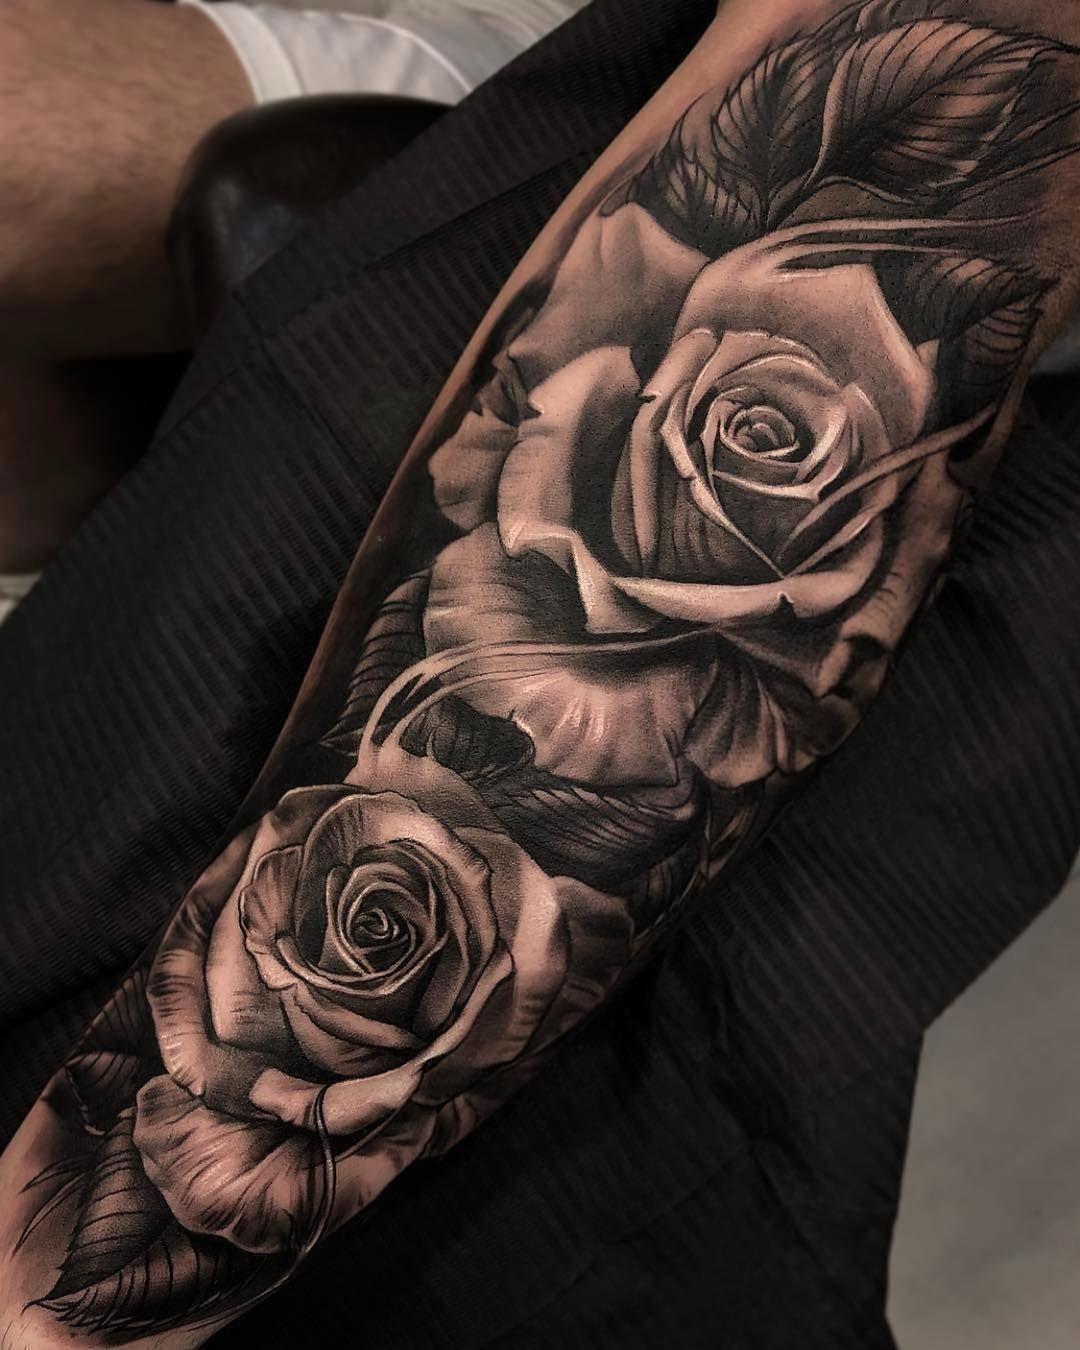 Shoulder Sleeve Rose Tattoos For Men Best Tattoo Ideas